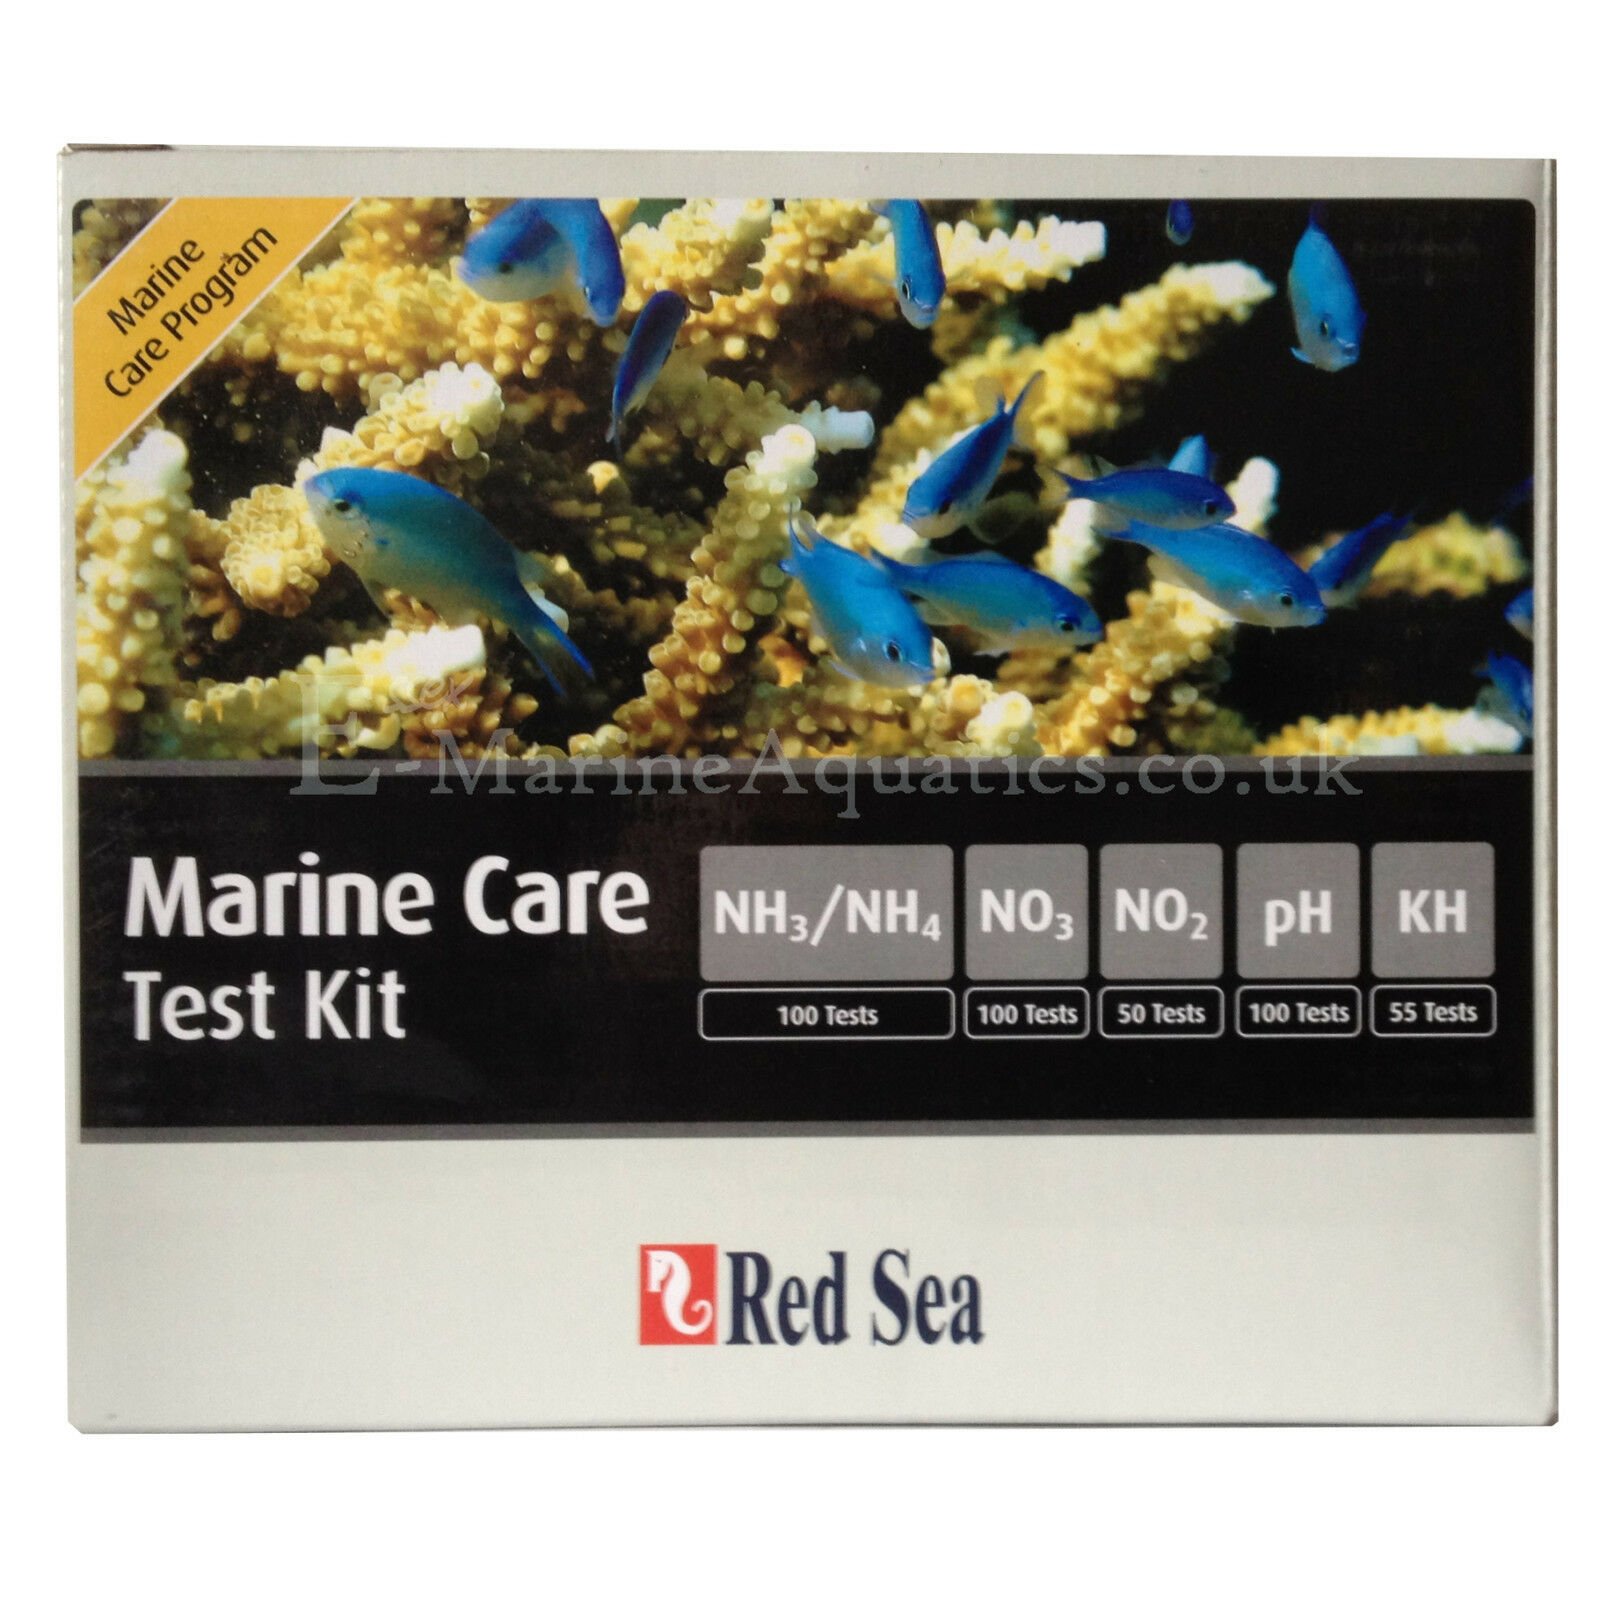 rot SEA MARINE CARE CARE CARE TEST KIT (AMMONIA NITRITE NITRATE pH ALK) 0983dd